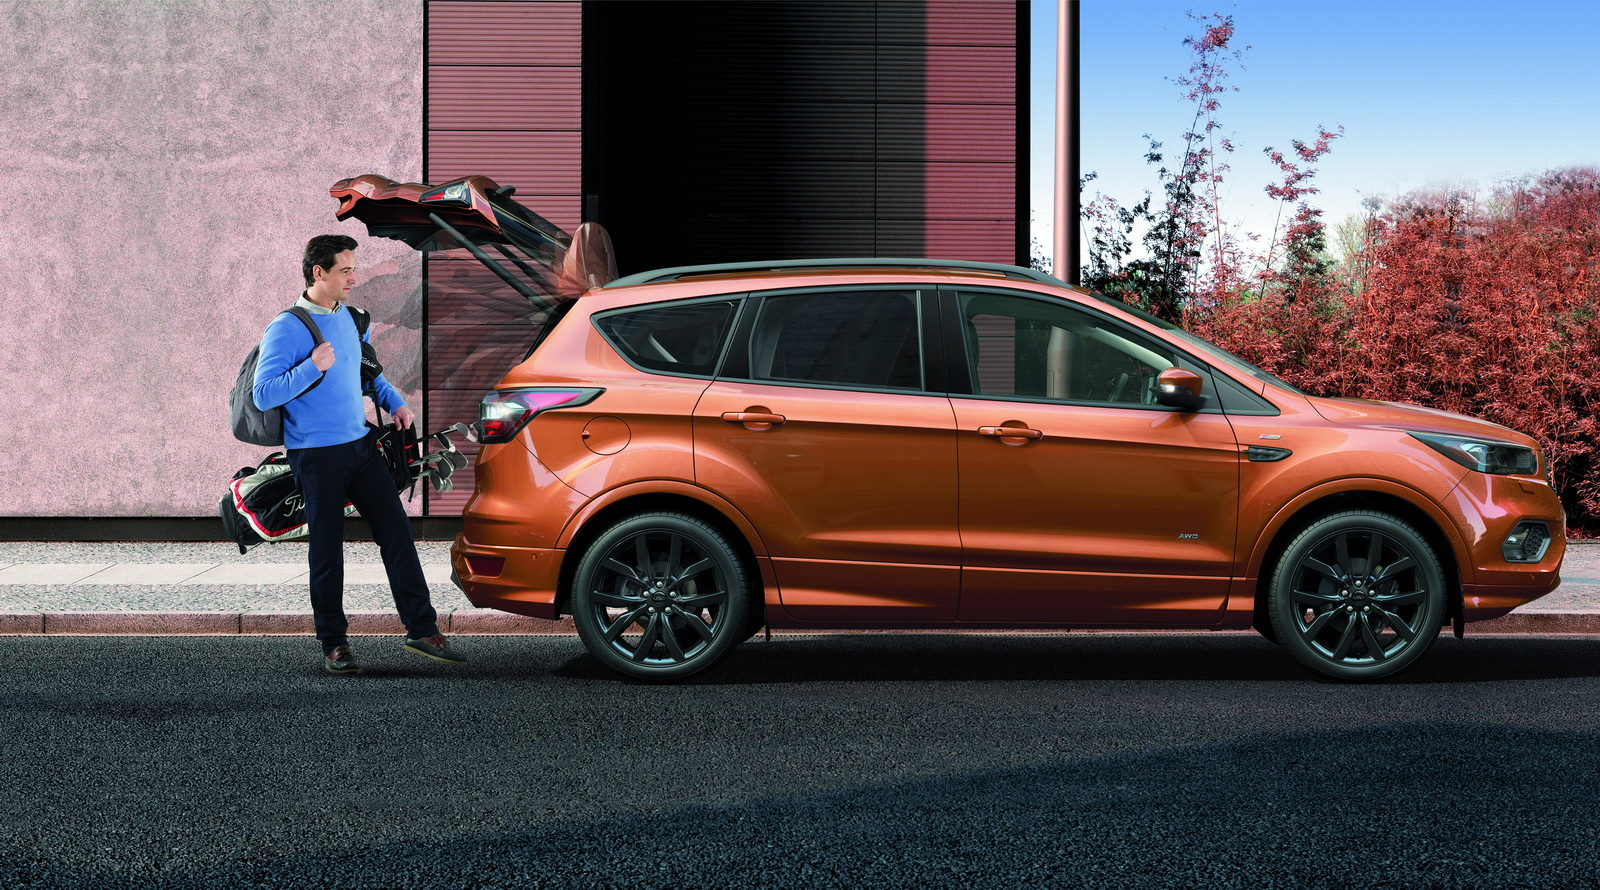 Ford Kuga ST-Line: El Kuga nos muestra su estética más deportiva 2